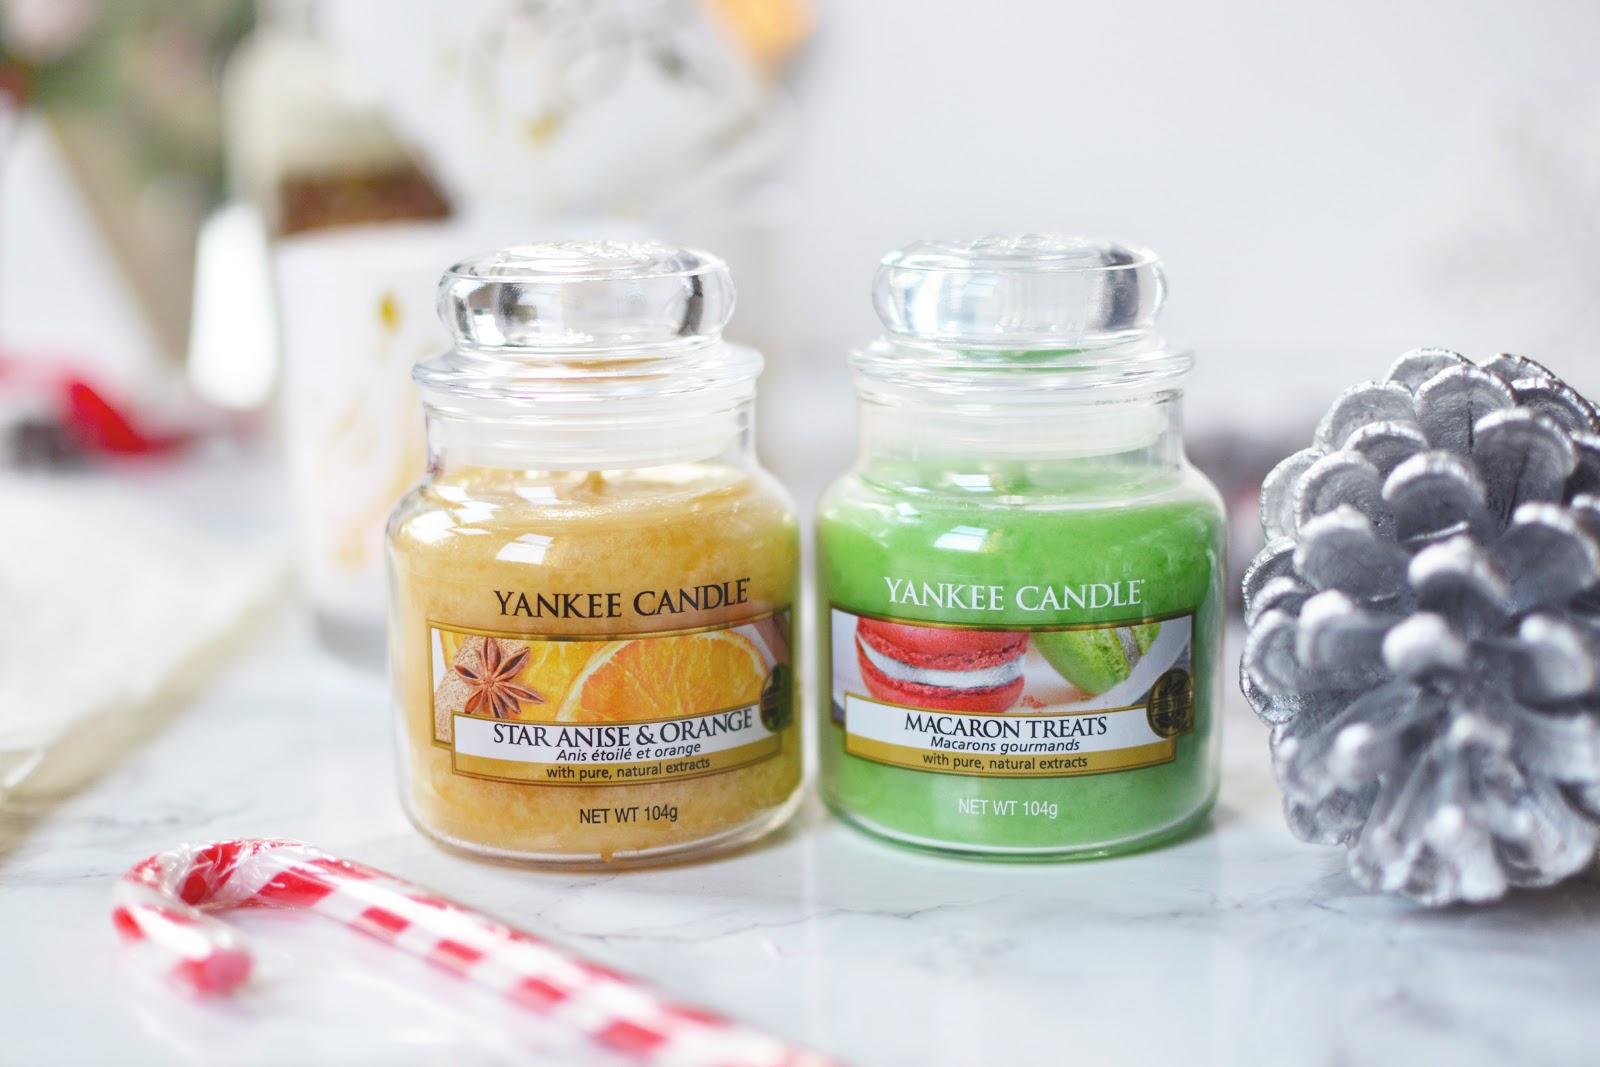 Yankee Candle Star Anise and Orange, Yankee Candle Macaron Treats